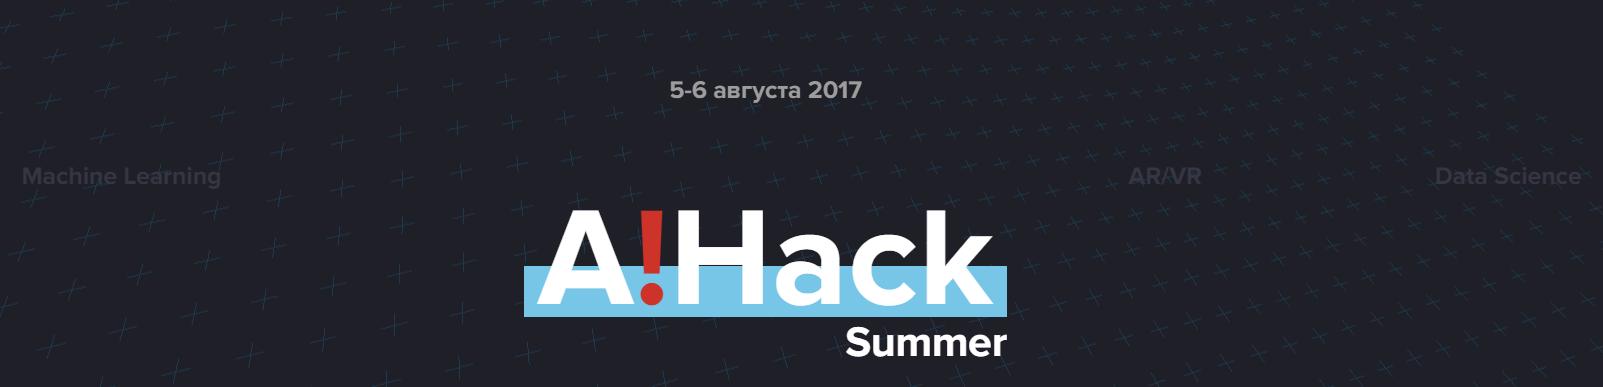 A!Hack Summer — хакатон Альфа-Банка 5 и 6 августа 2017 - 1